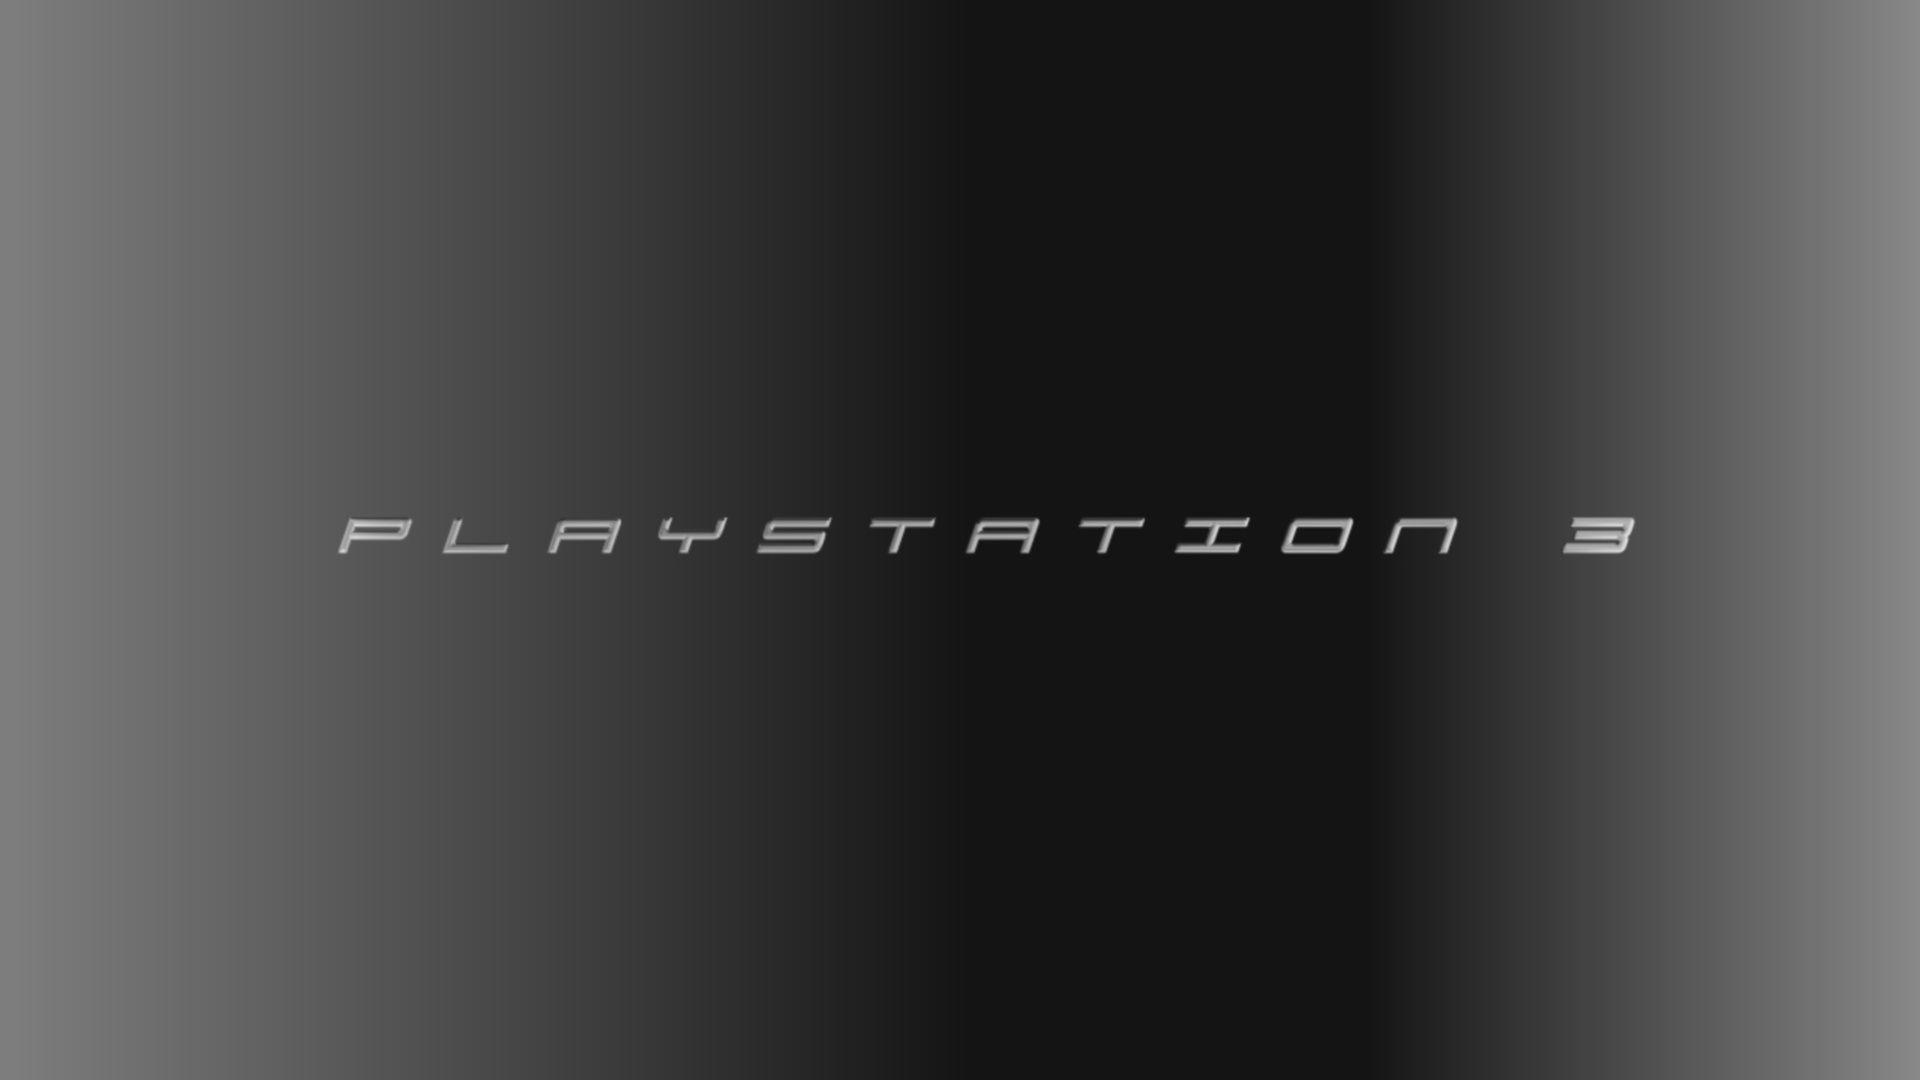 playstation 3 wallpapers 1080p wallpaper cave